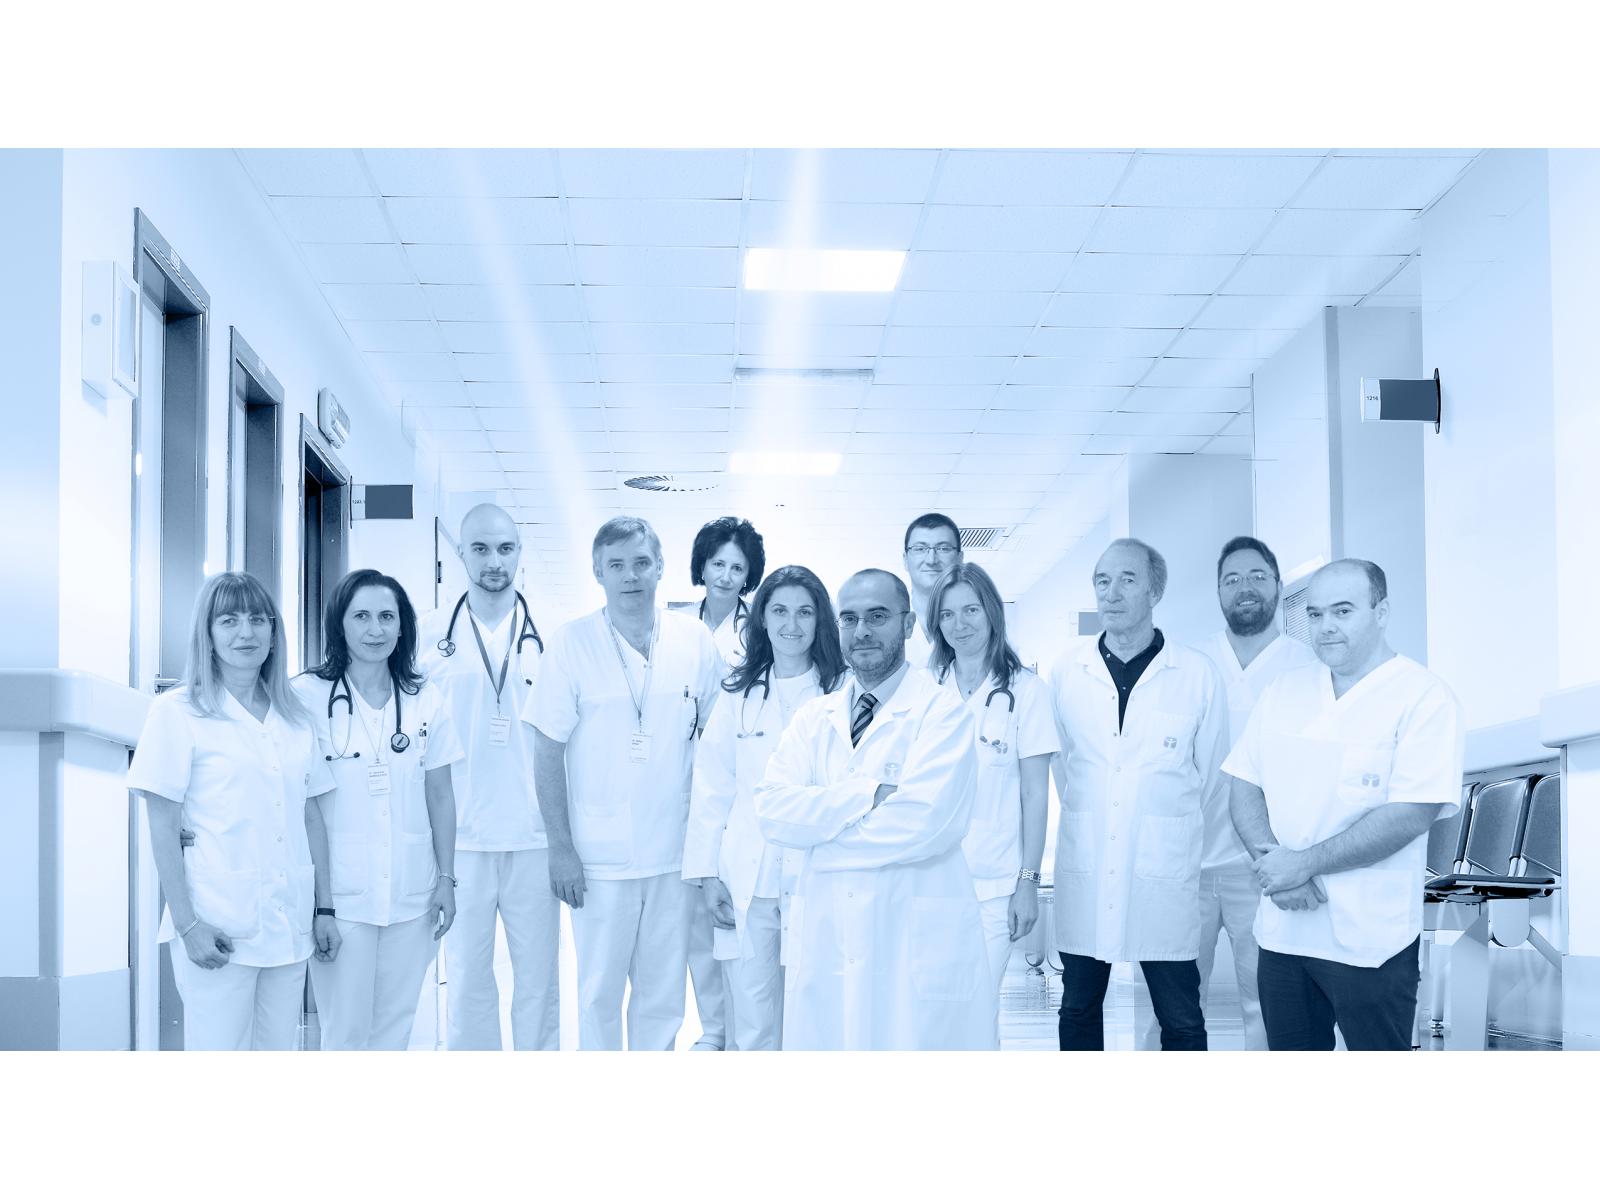 Spitalul de cardiologie CLINICCO - clinicco-youtube-cover.png